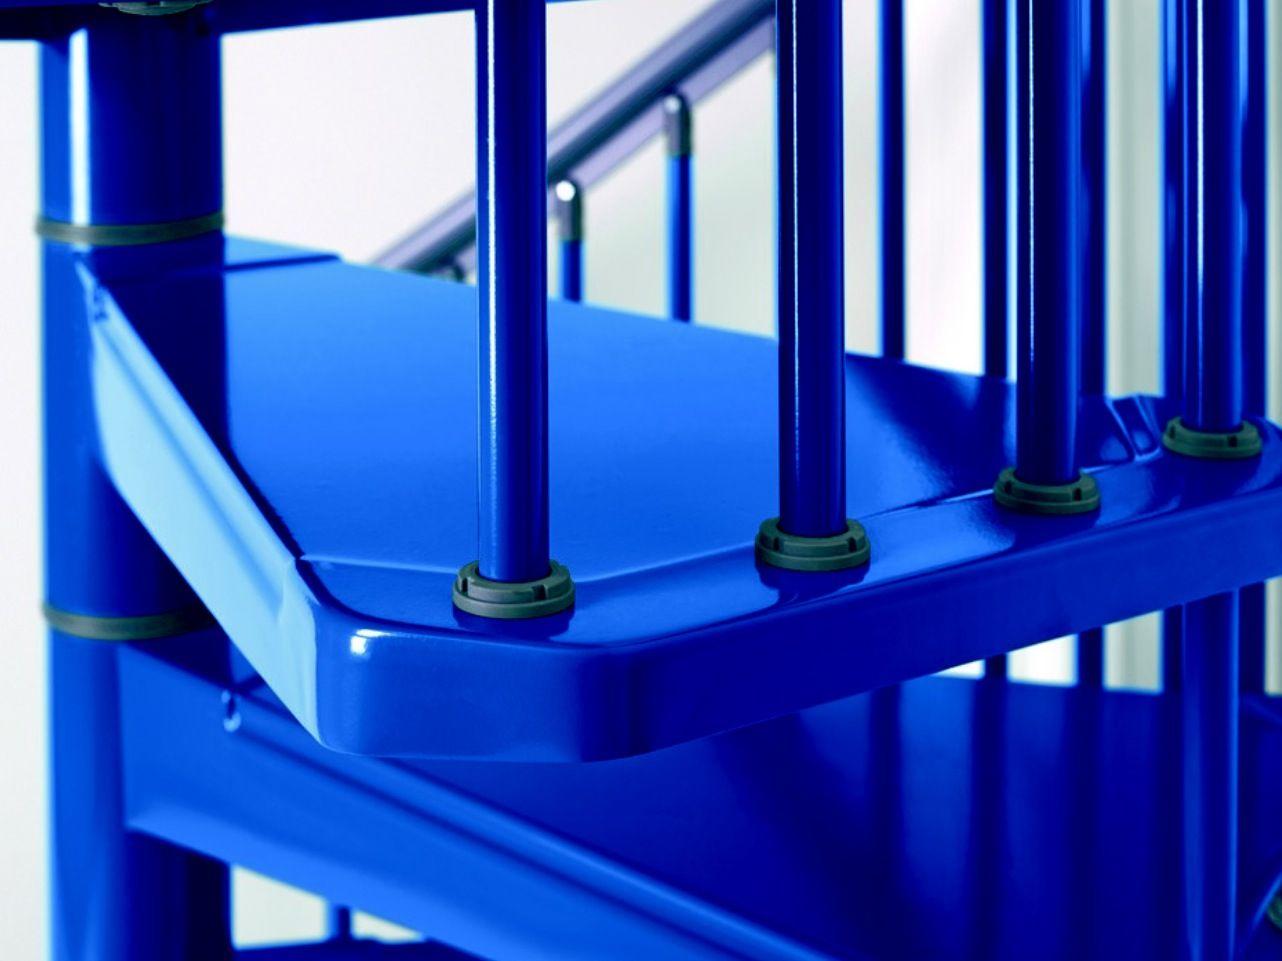 Blue cobalt metallic stairs.